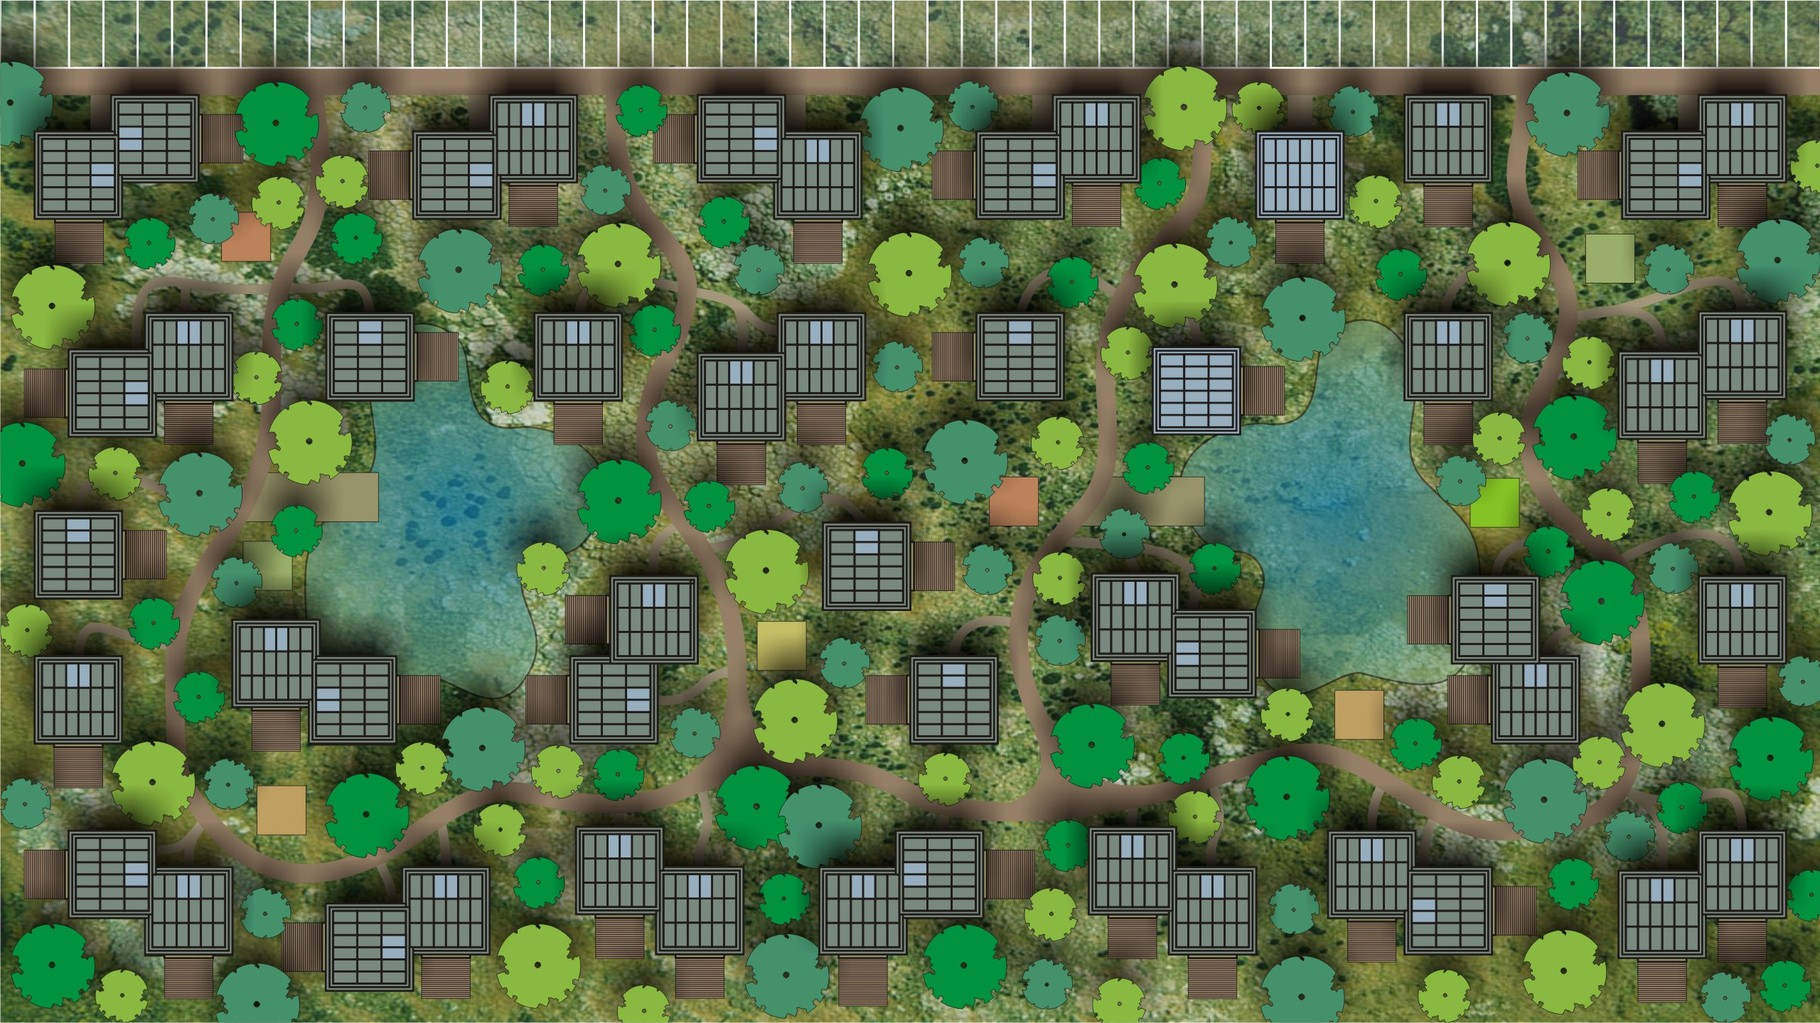 Visual OAS1S™: High-density 100% green and car-free urban design plus integrated urban farming.